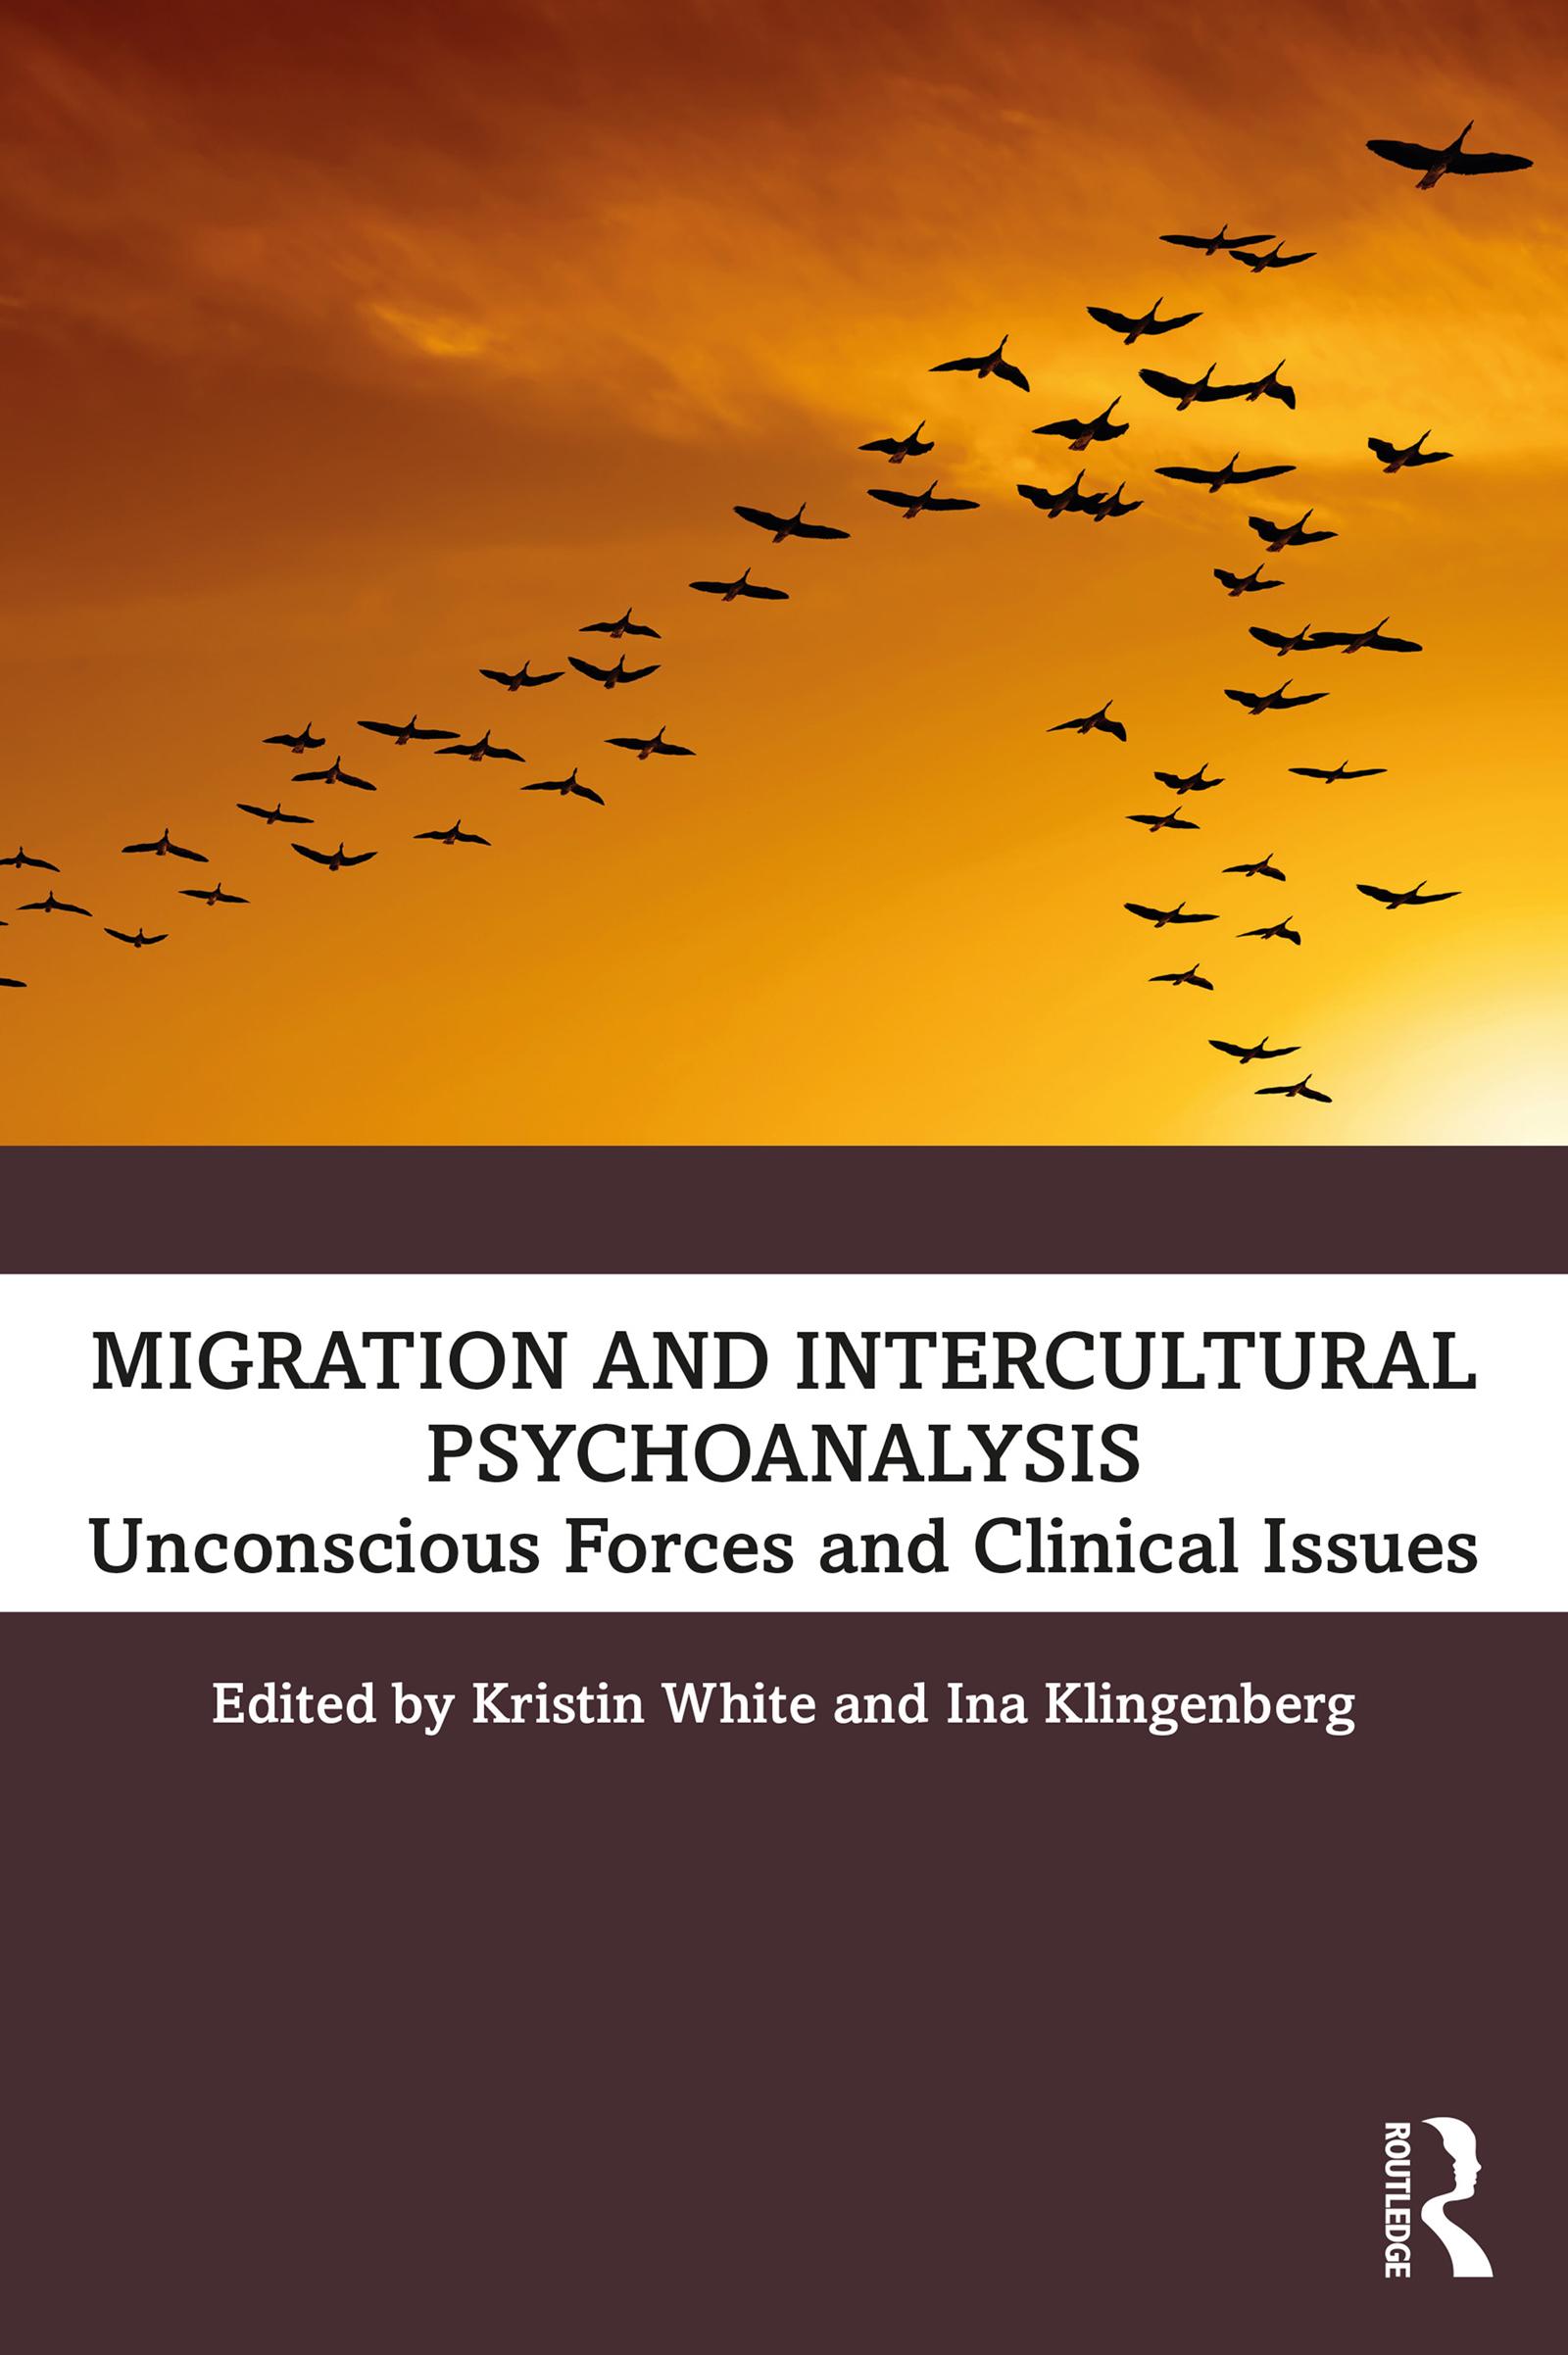 Migration and Intercultural Psychoanalysis